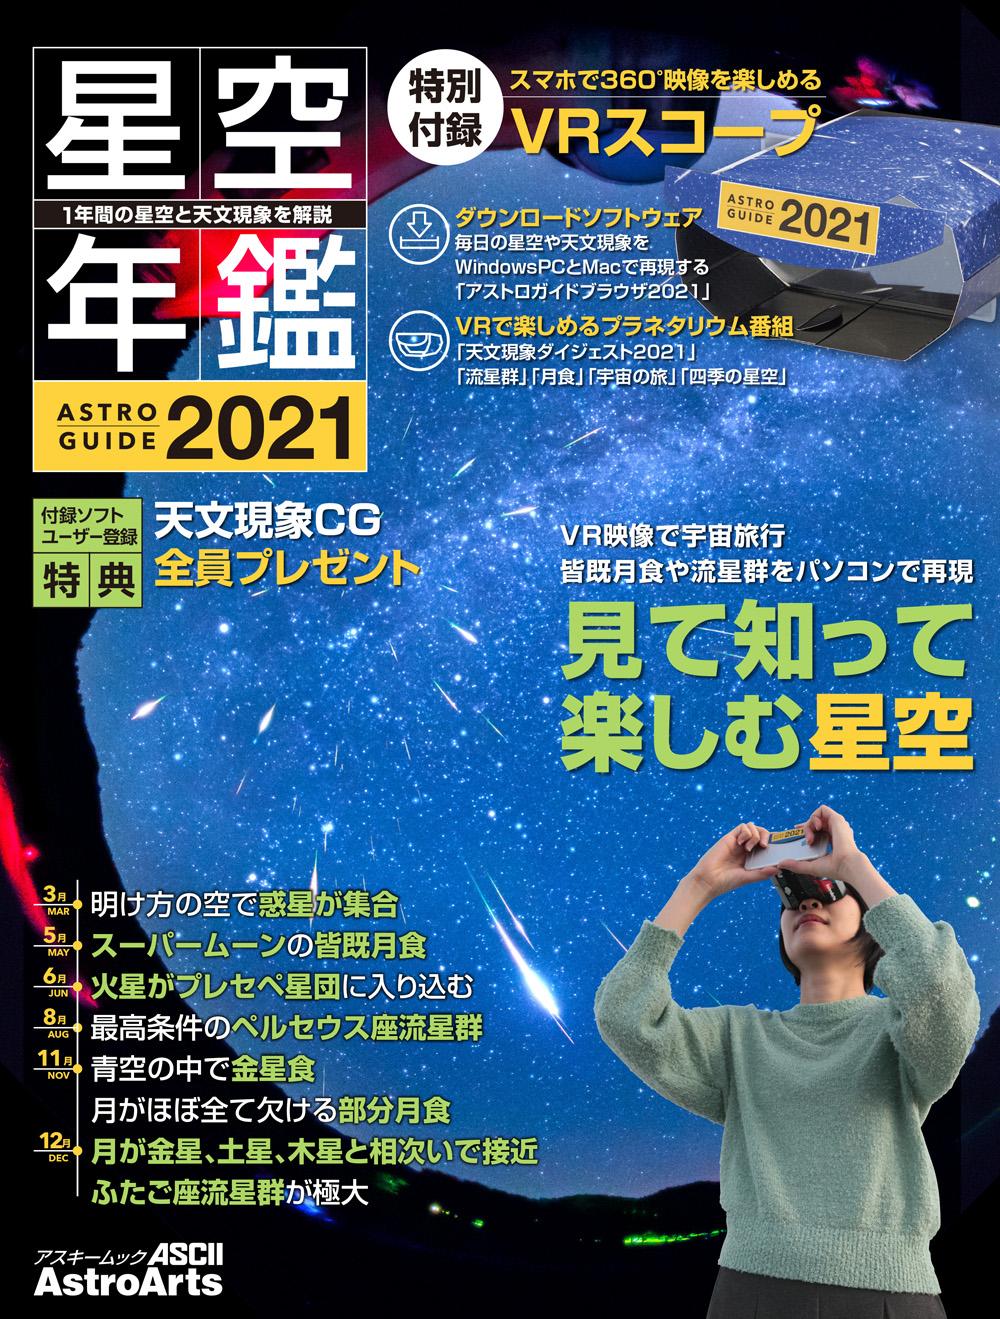 ASTROGUIDE 星空年鑑2021 2021年の星空と天文現象を解説 VR映像で宇宙旅行 皆既月食や流星群をパソコンで再現